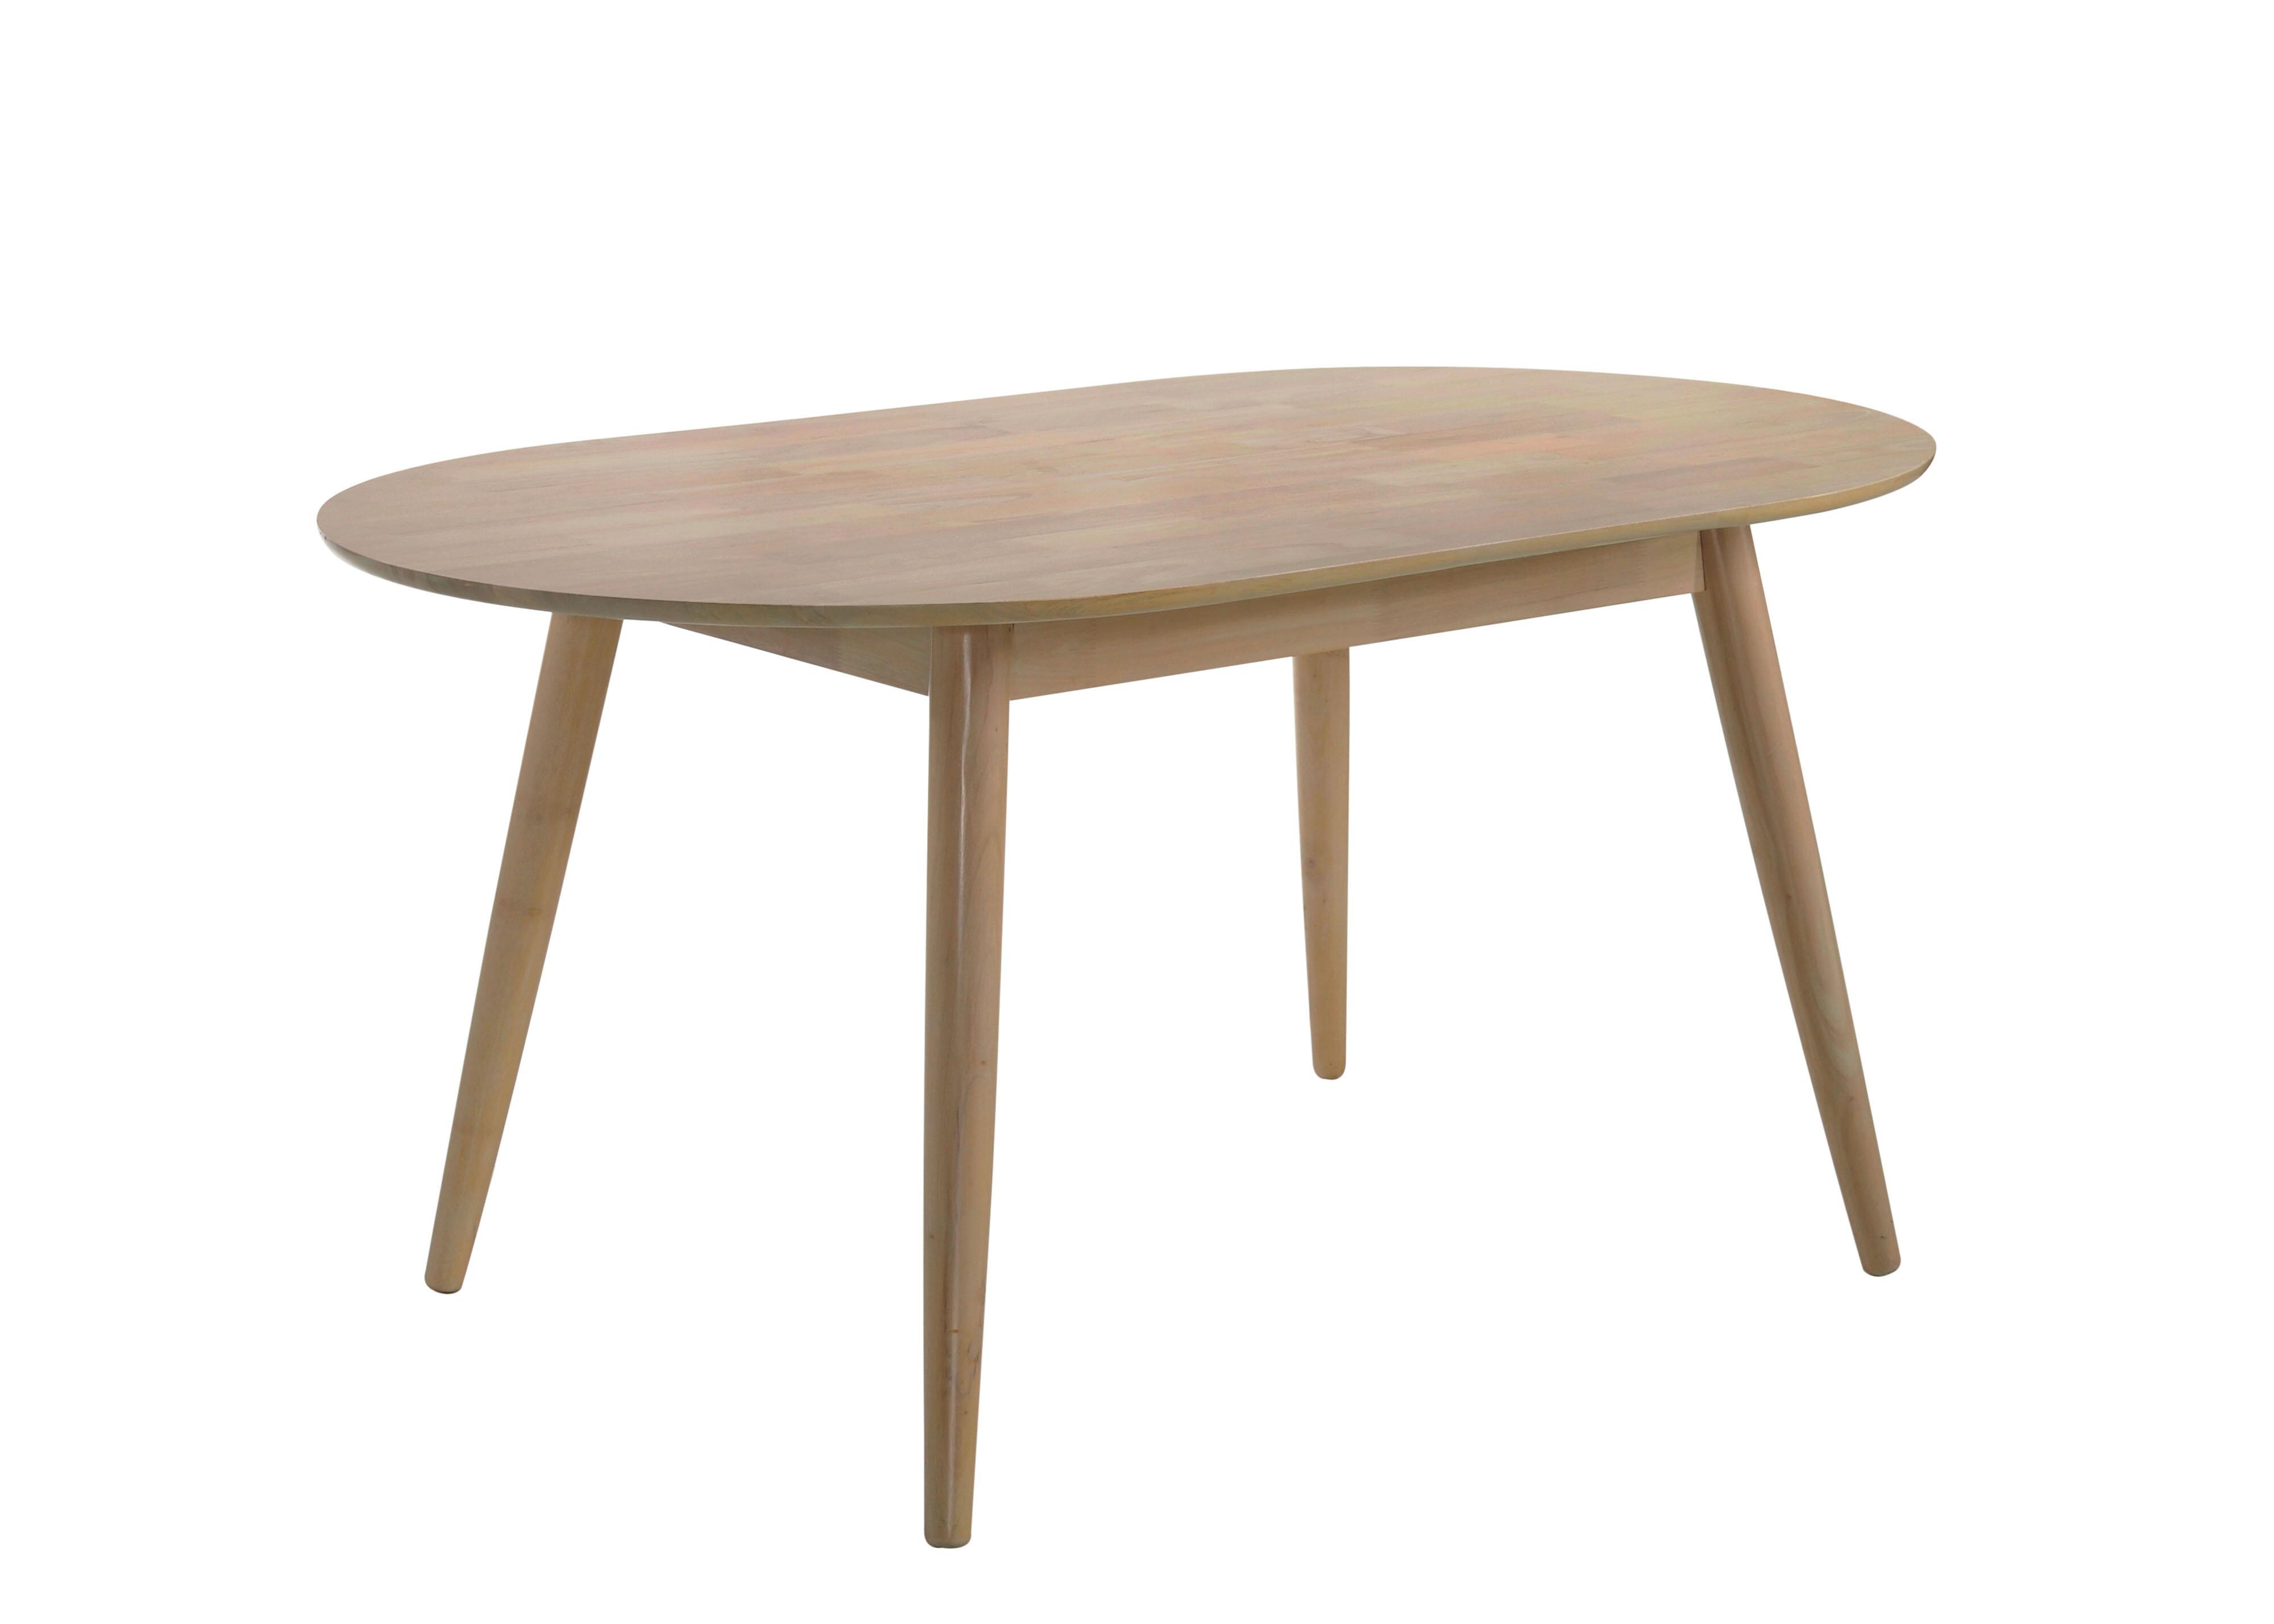 Castaneda Mid Cenutry Modern Solid Wood Dining Table